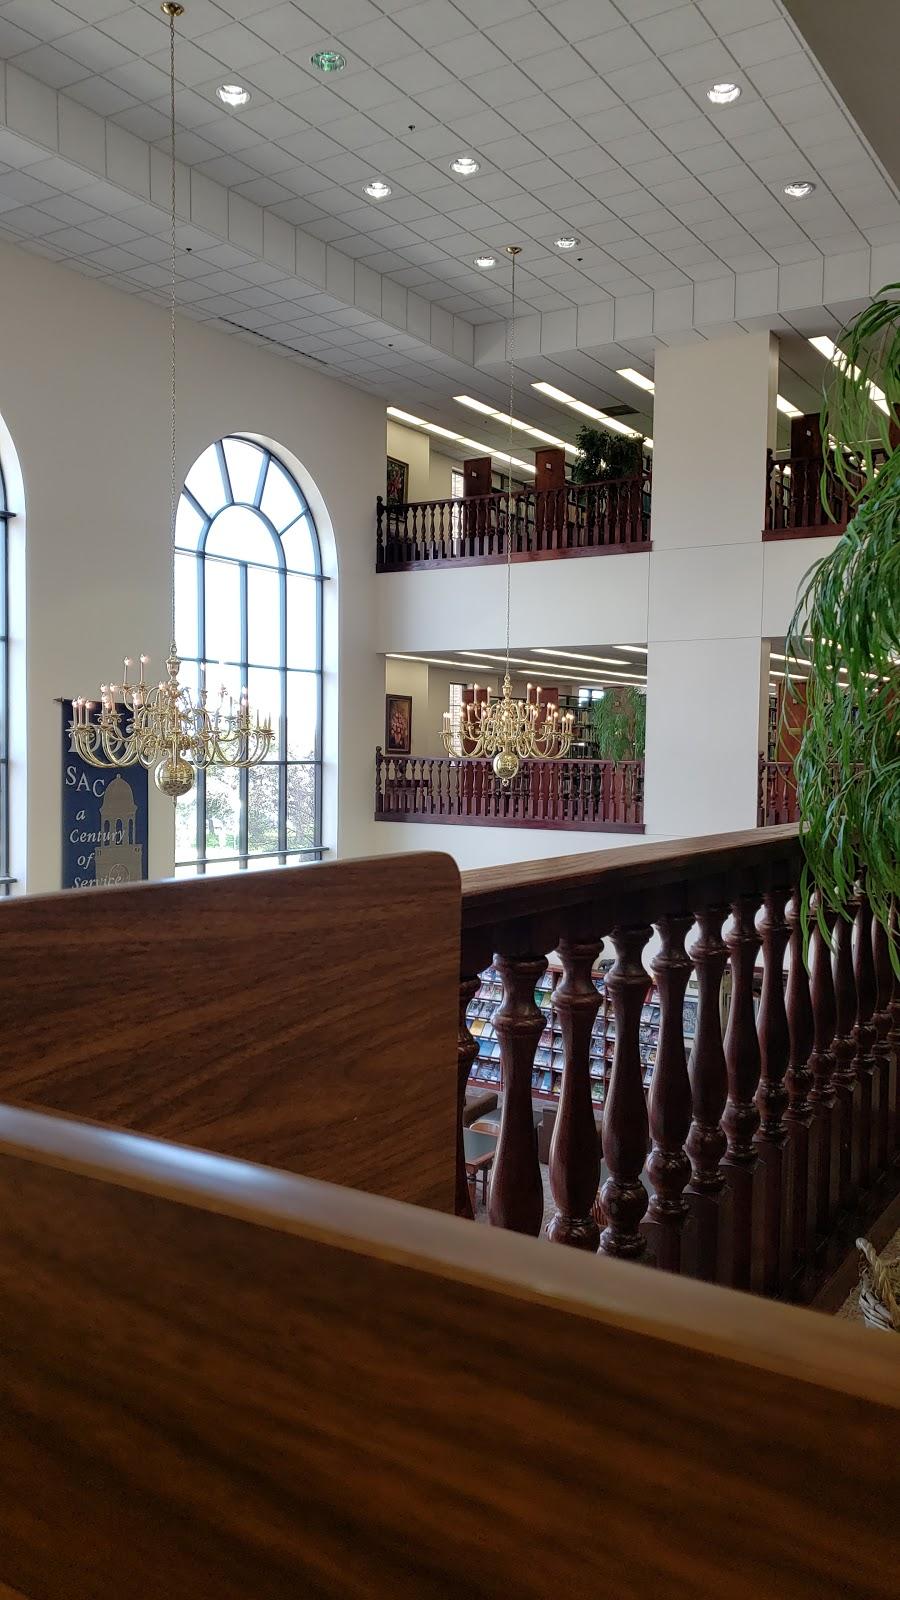 Chan Shun Centennial Library - library  | Photo 2 of 4 | Address: 101 W Magnolia St, Keene, TX 76059, USA | Phone: (817) 202-6242